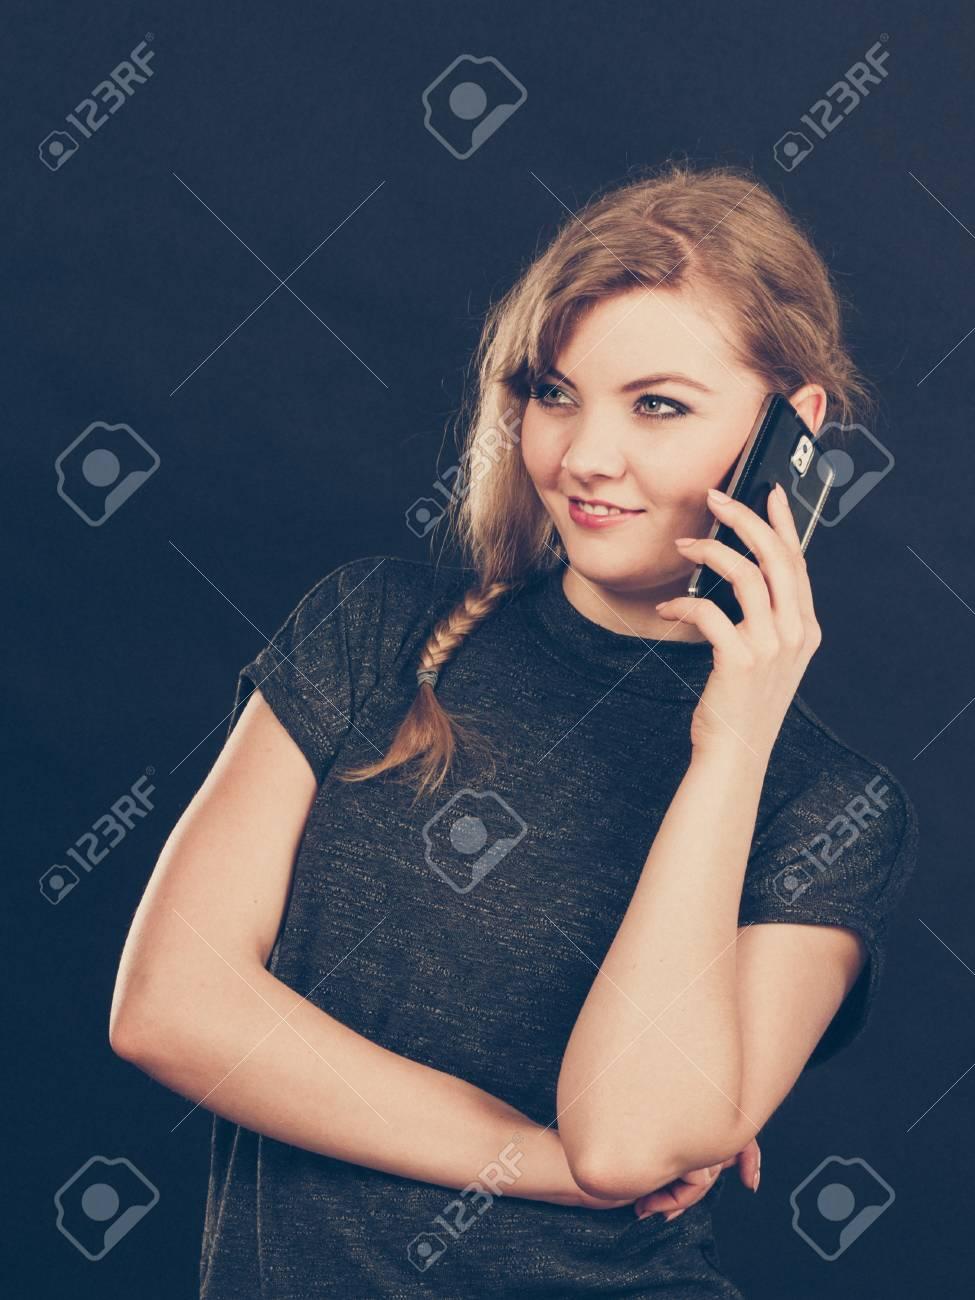 Flirt and romance  Begin of relatinship  Attractive blonde woman